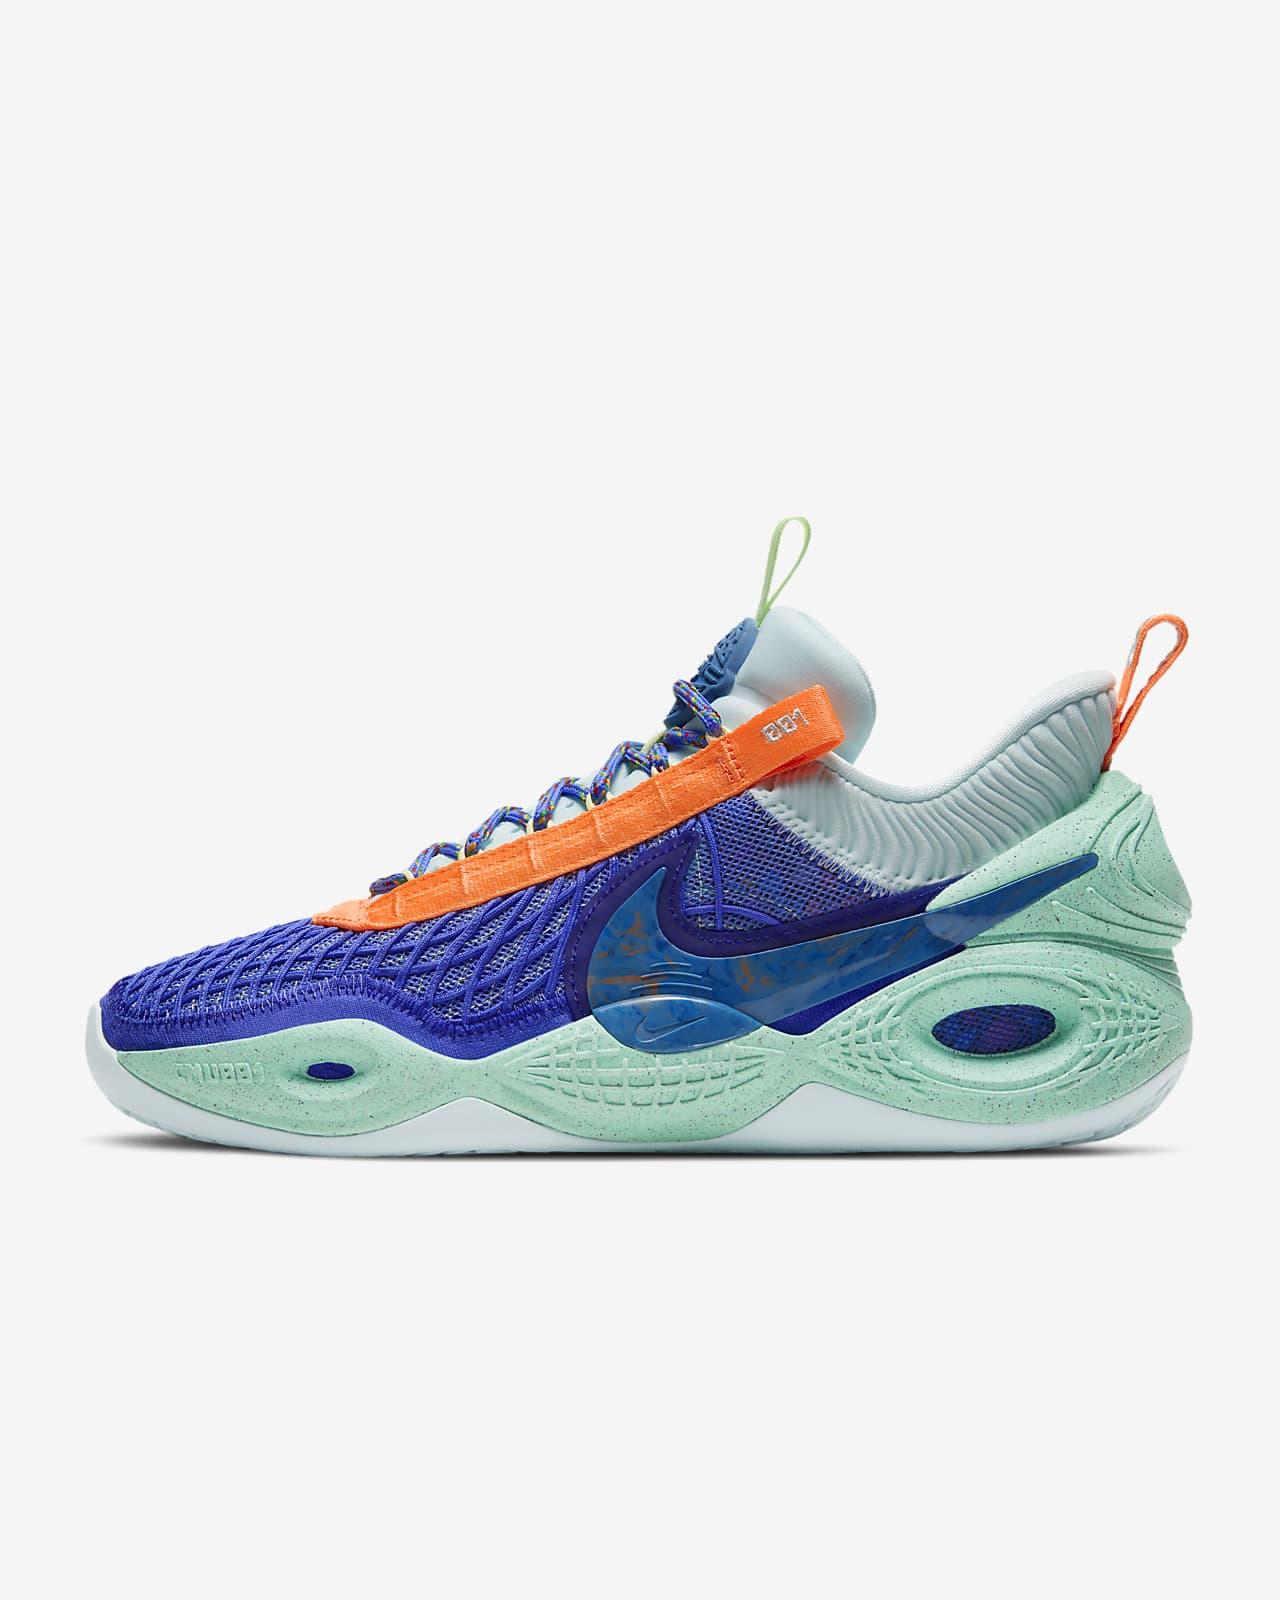 Nike Cosmic Unity 'Amalgam' Basketbalschoen